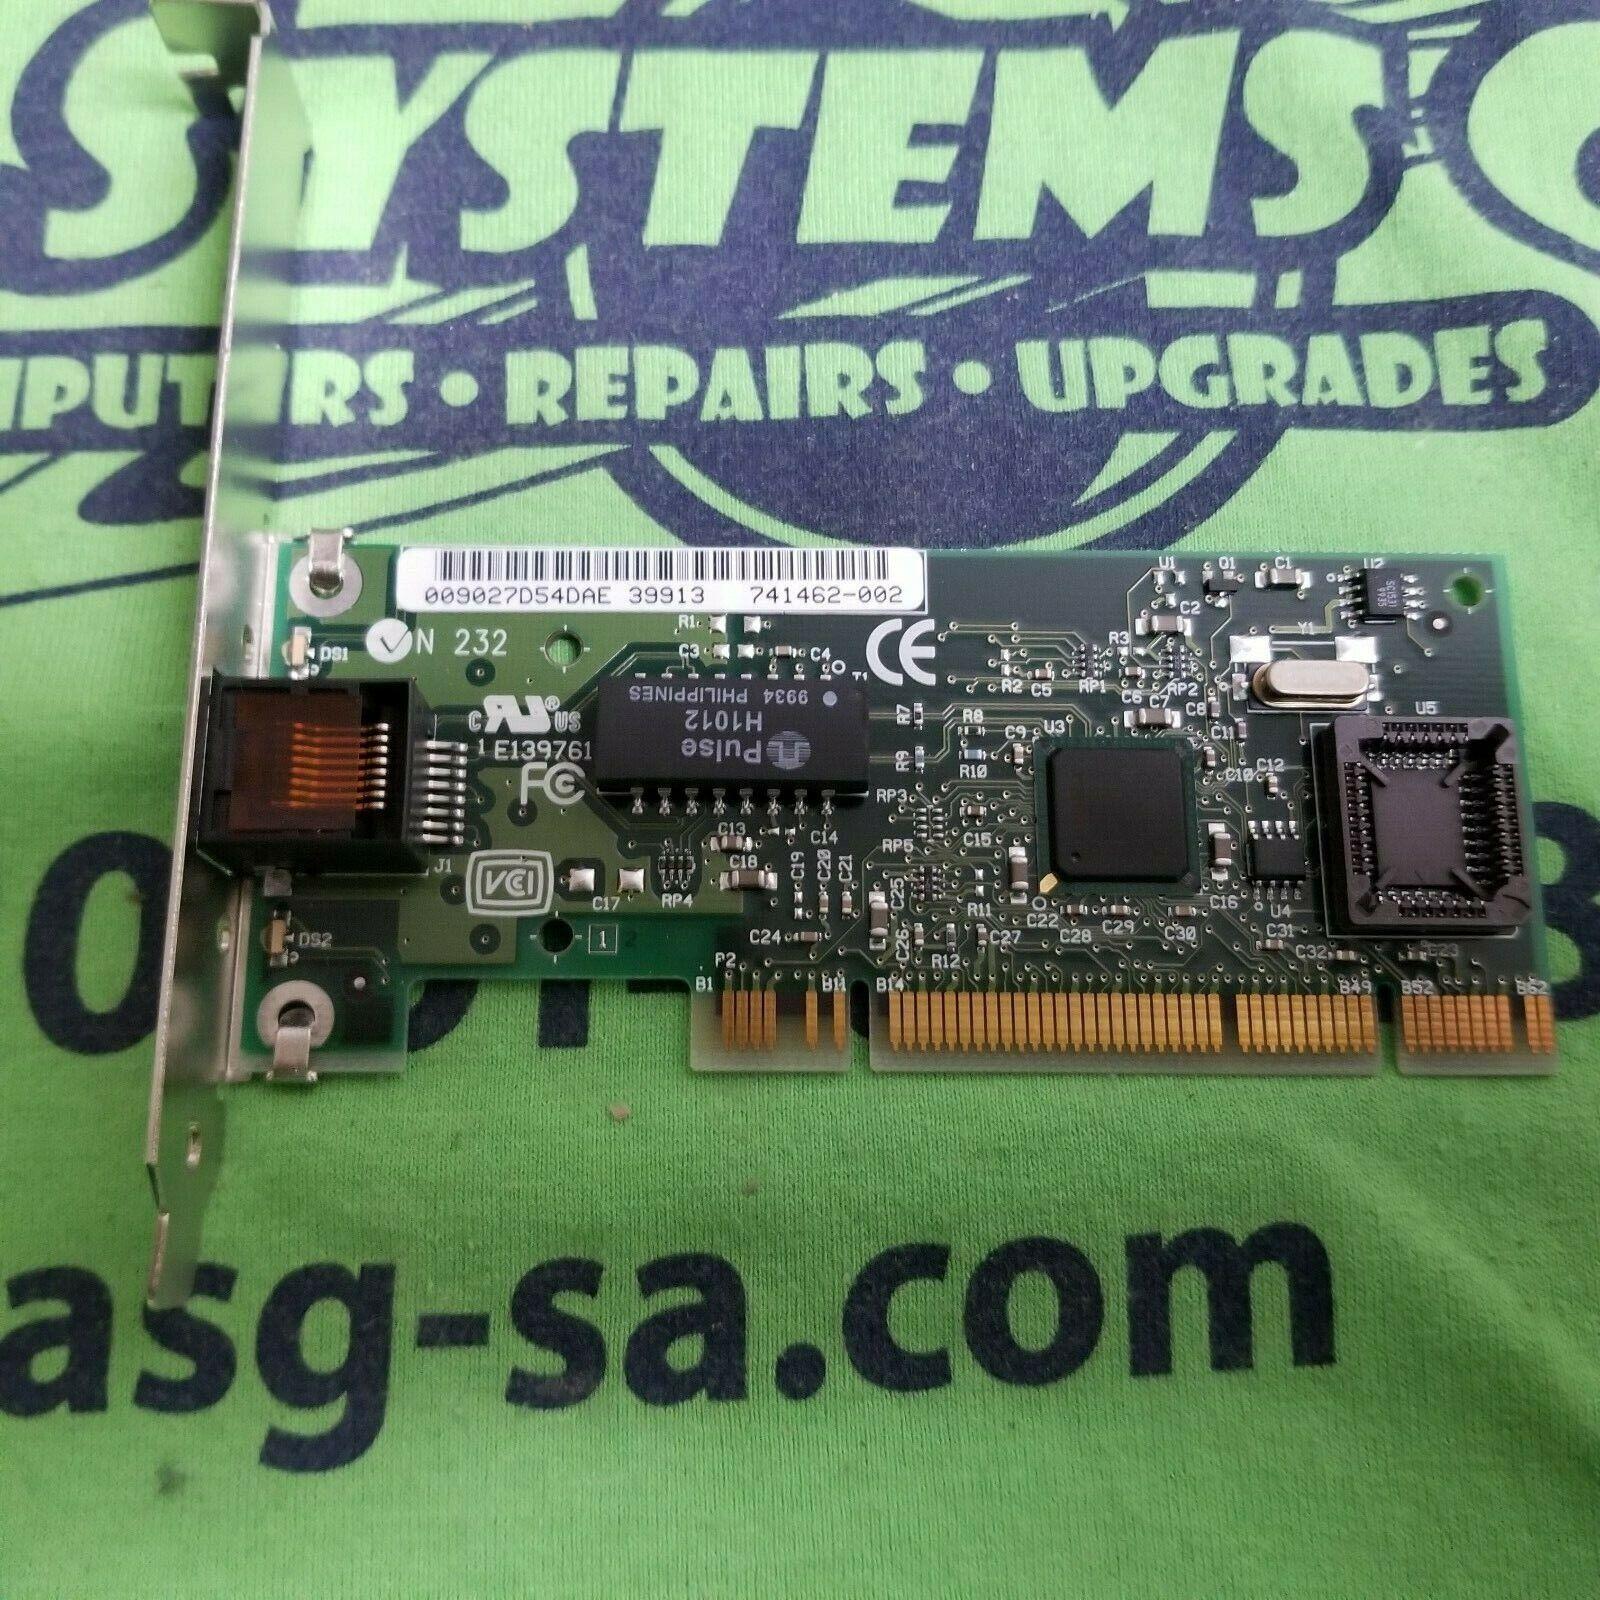 Intel 741462-002 Network, PRO/100+ TP - 742043-001 / 742042-001